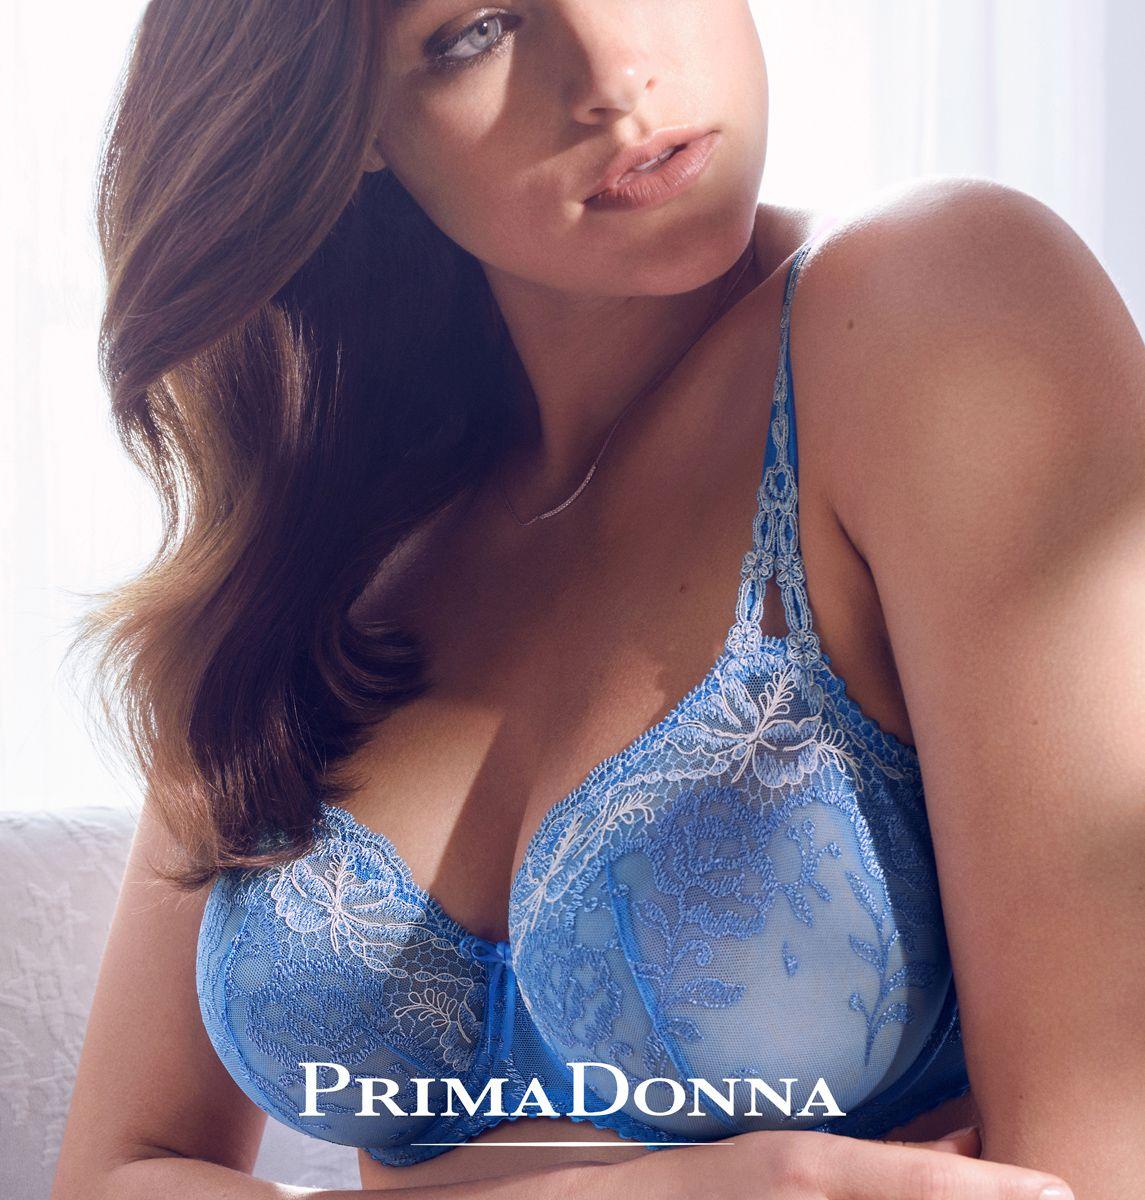 Undergarments for open back wedding dress  BH Prima Donna delight shop online  cretmomentsnl